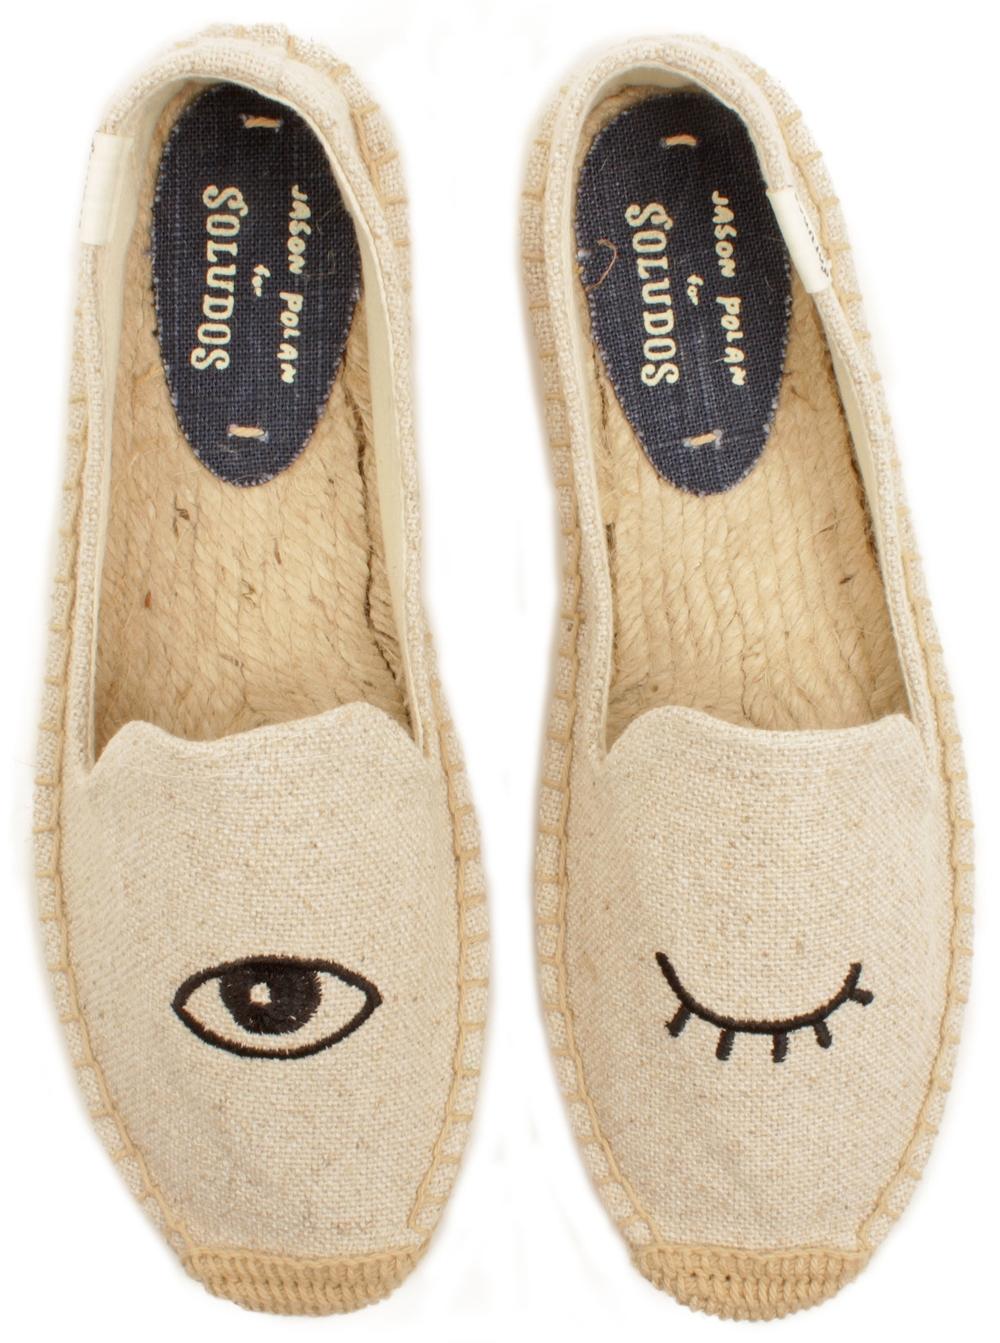 """Wink"" Slippers (cute & super comfy!)"